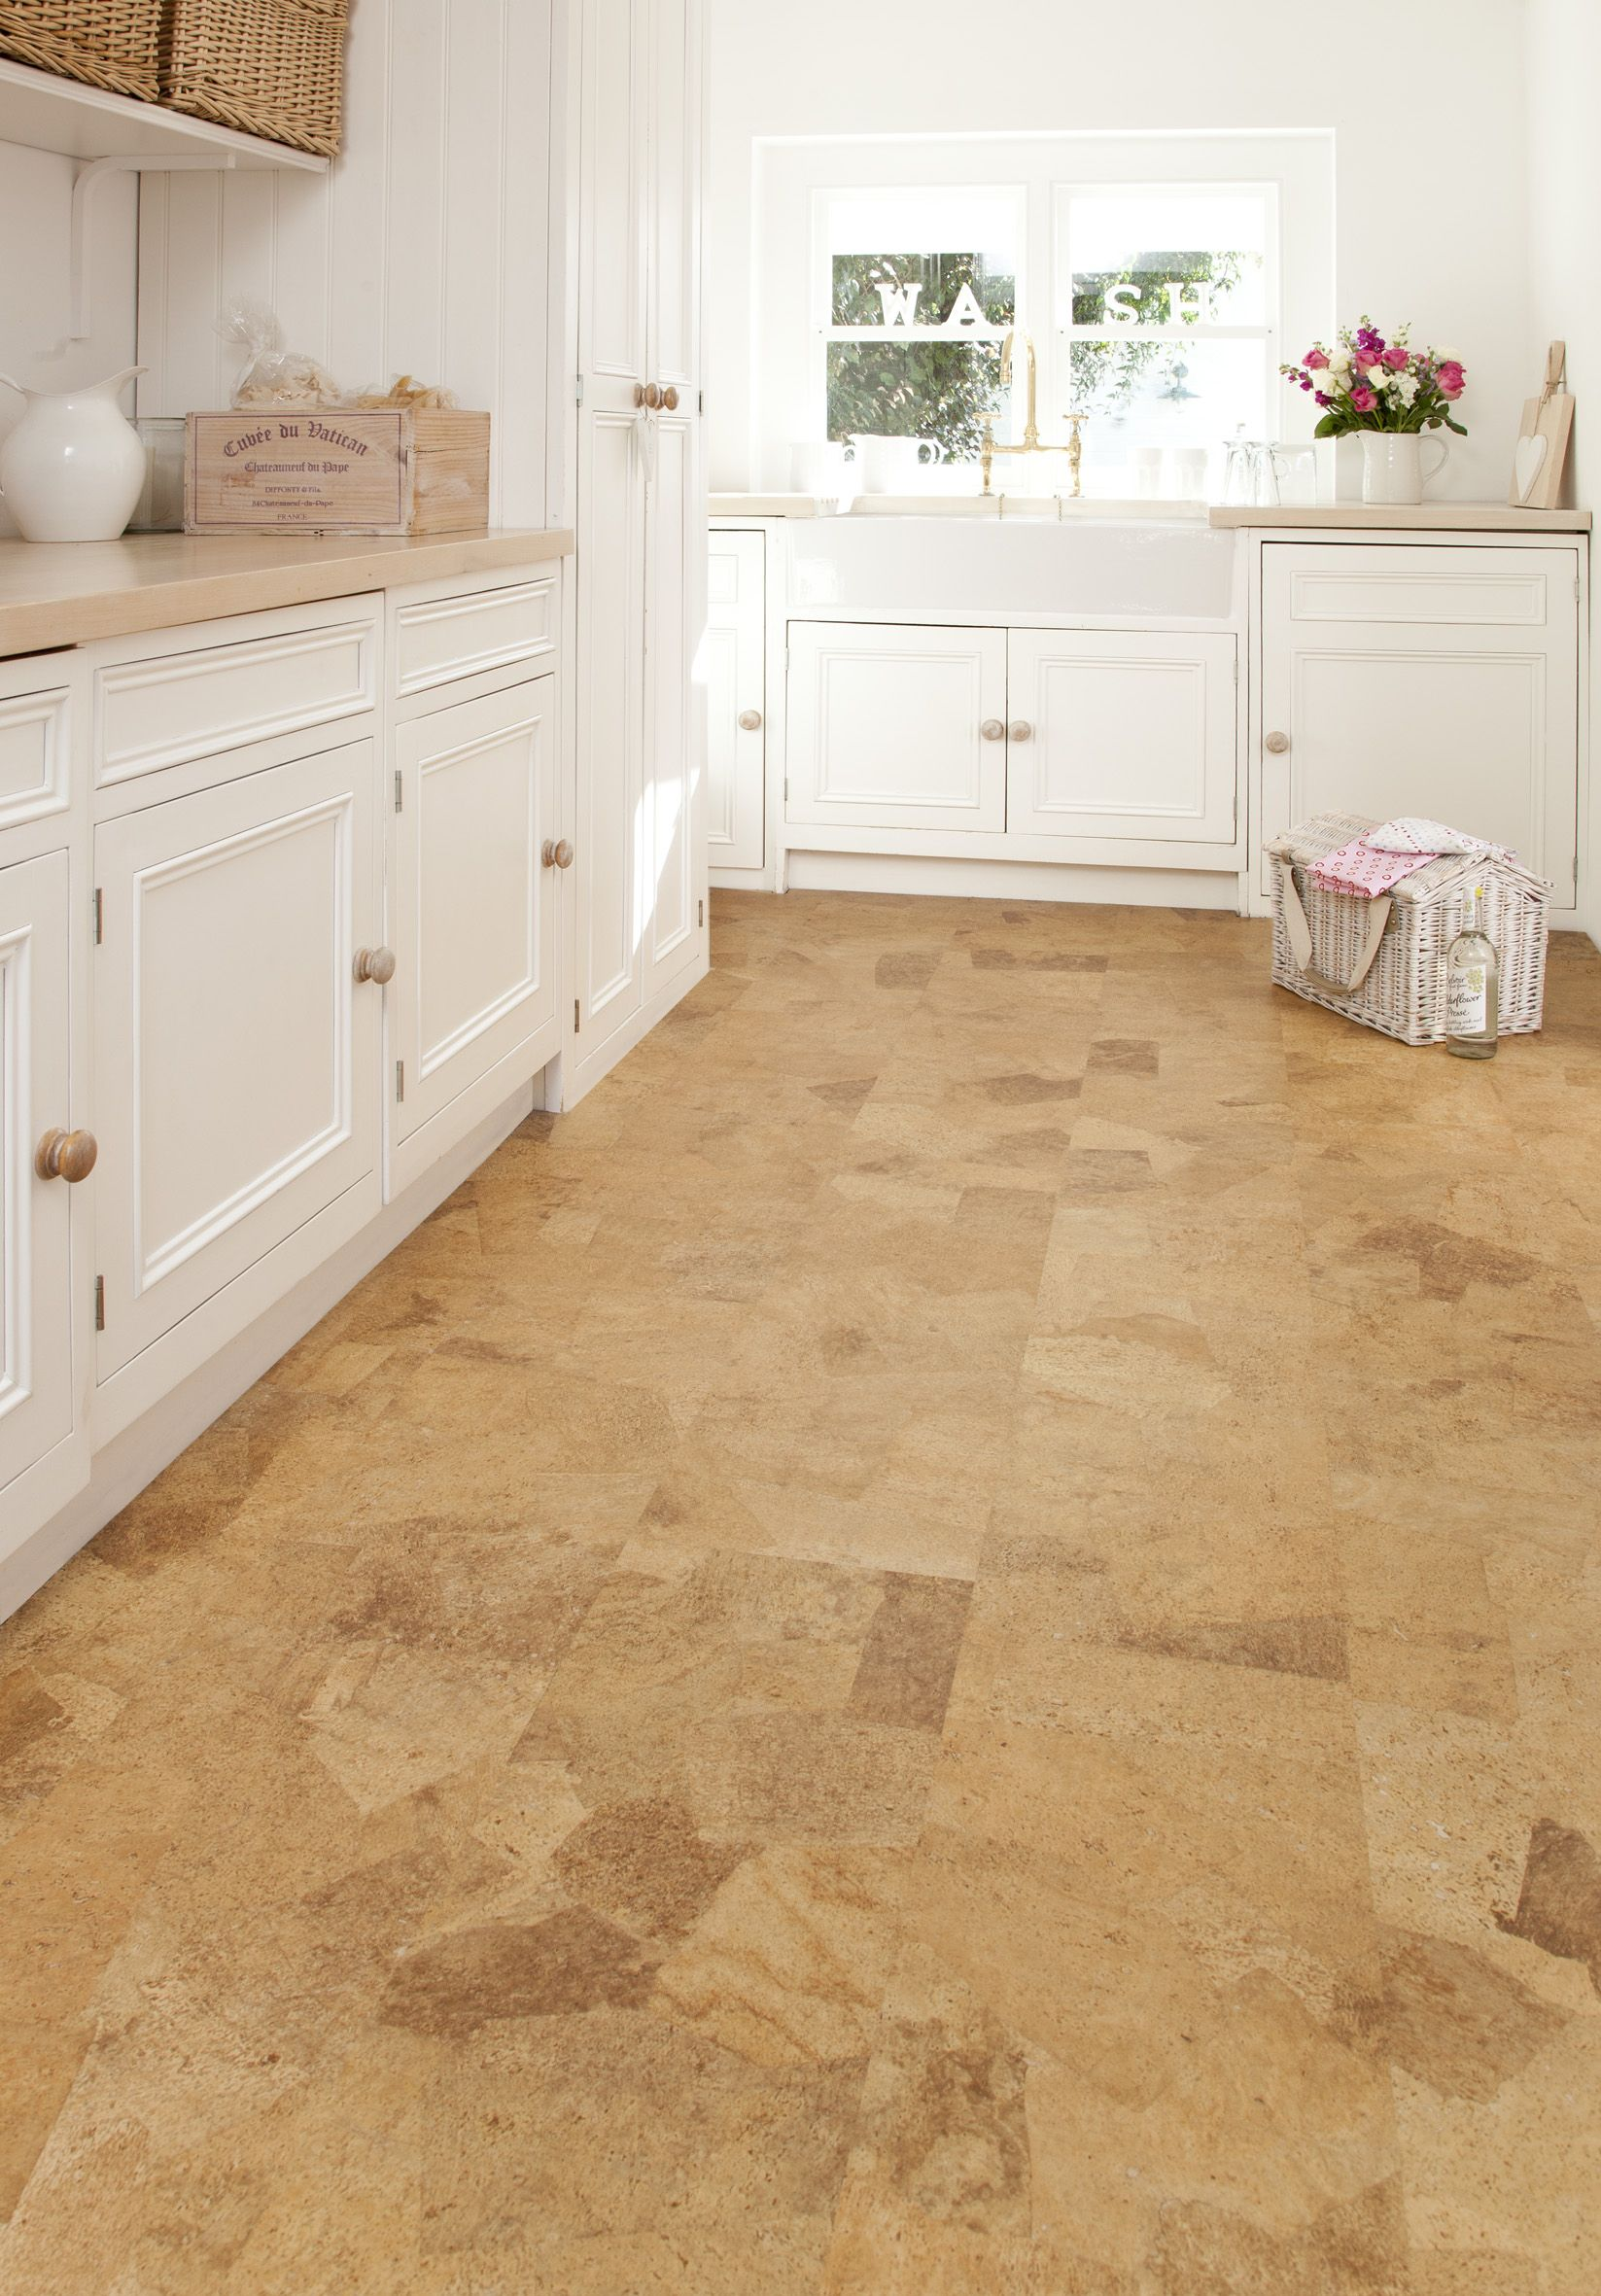 floor tile designs cork flooring kitchen Cork floor kitchen